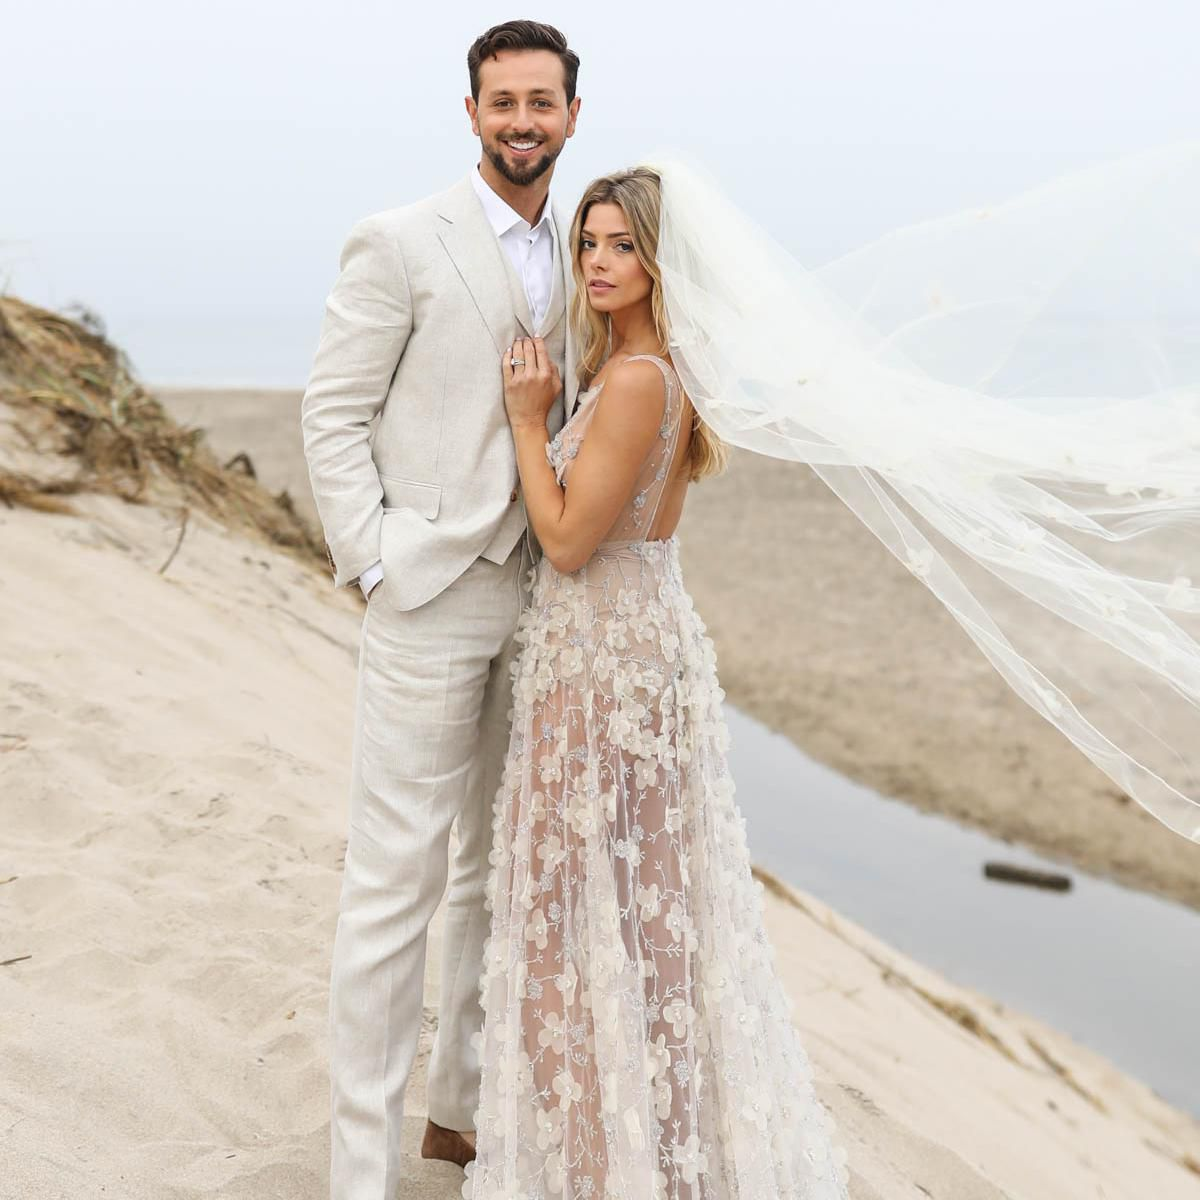 Ashley Greene is Honeymooning on a Nude Beach After her Wedding